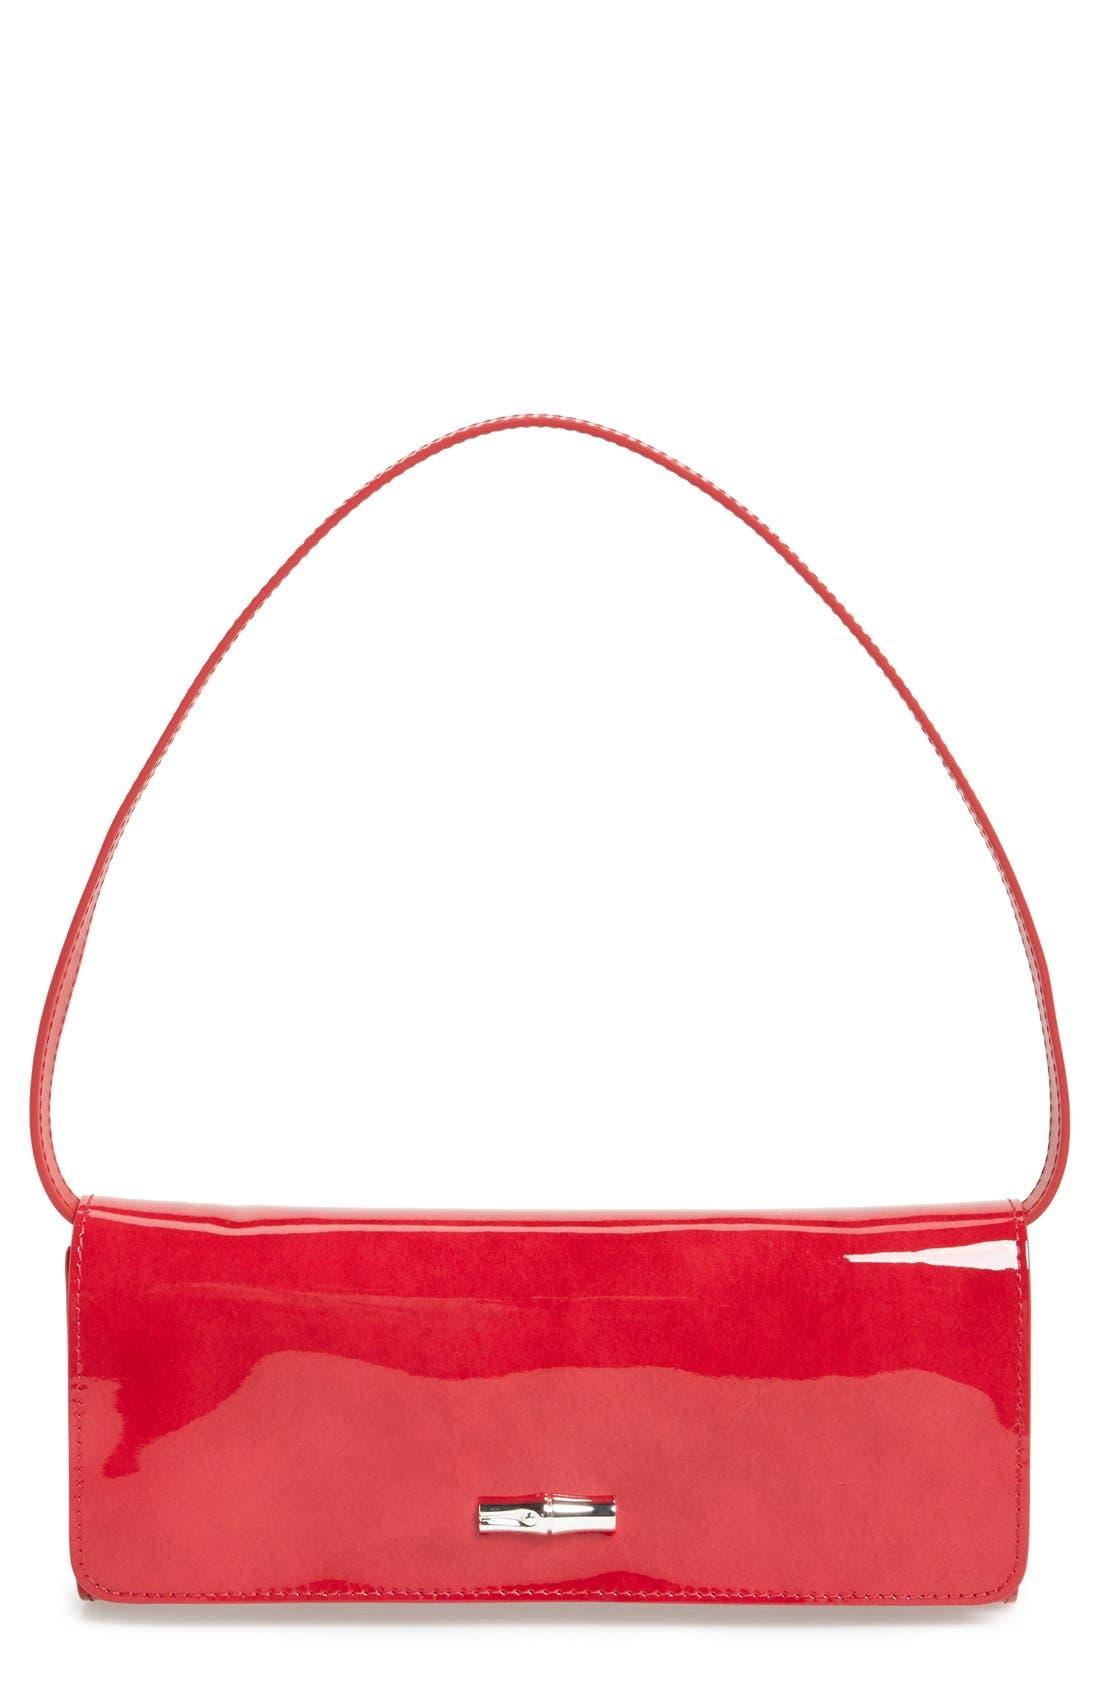 Alternate Image 1 Selected - Longchamp 'Roseau Box' Clutch